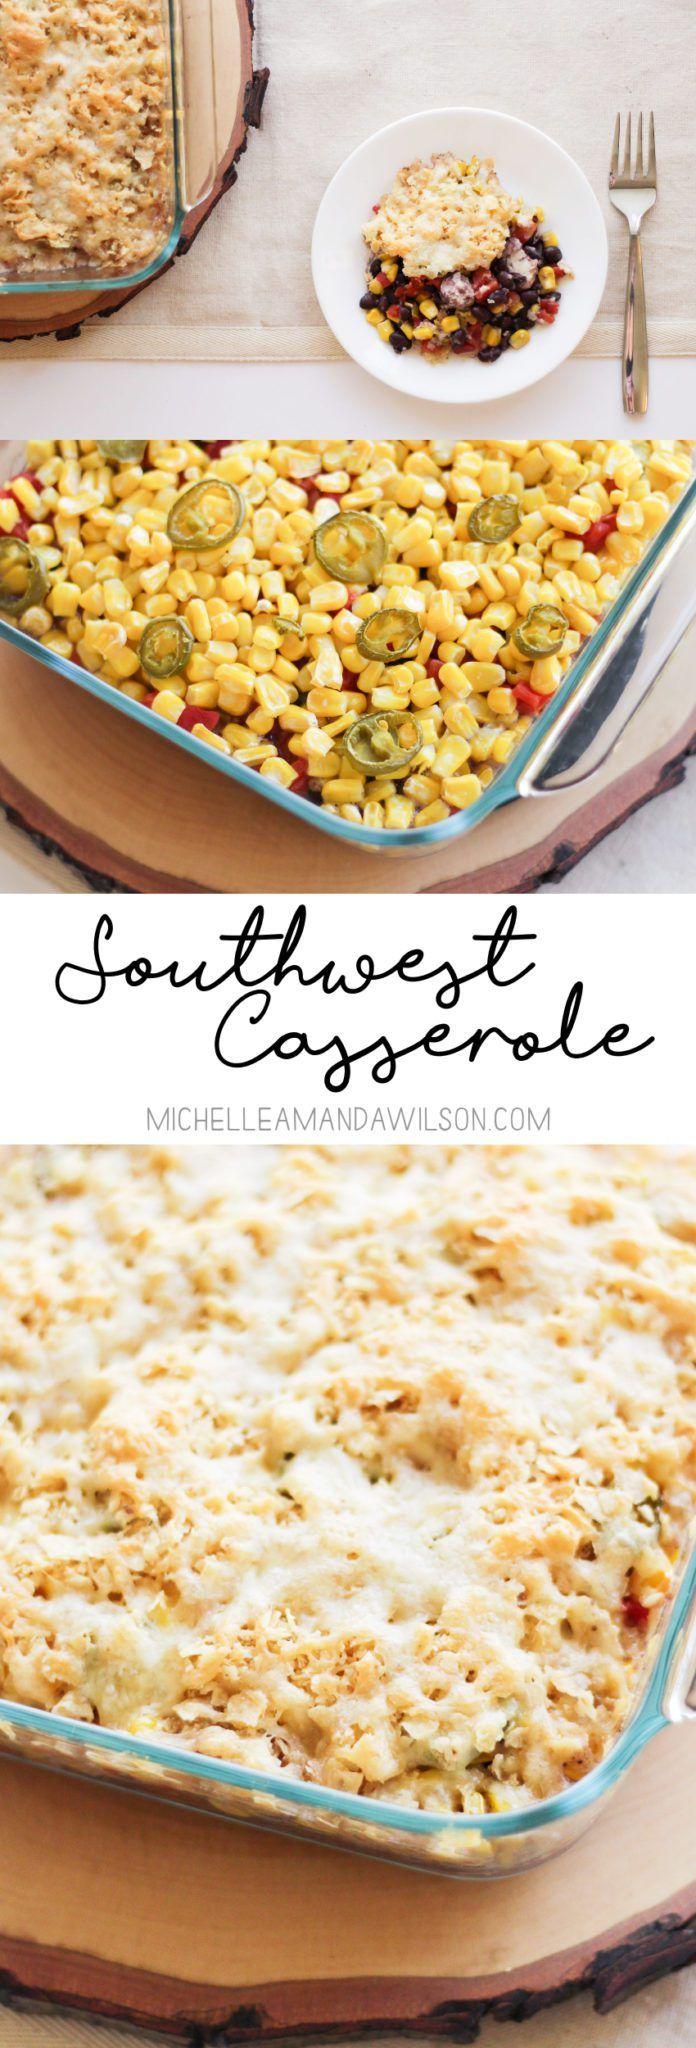 Southwest Casserole Recipe - Michelle Amanda Wilson